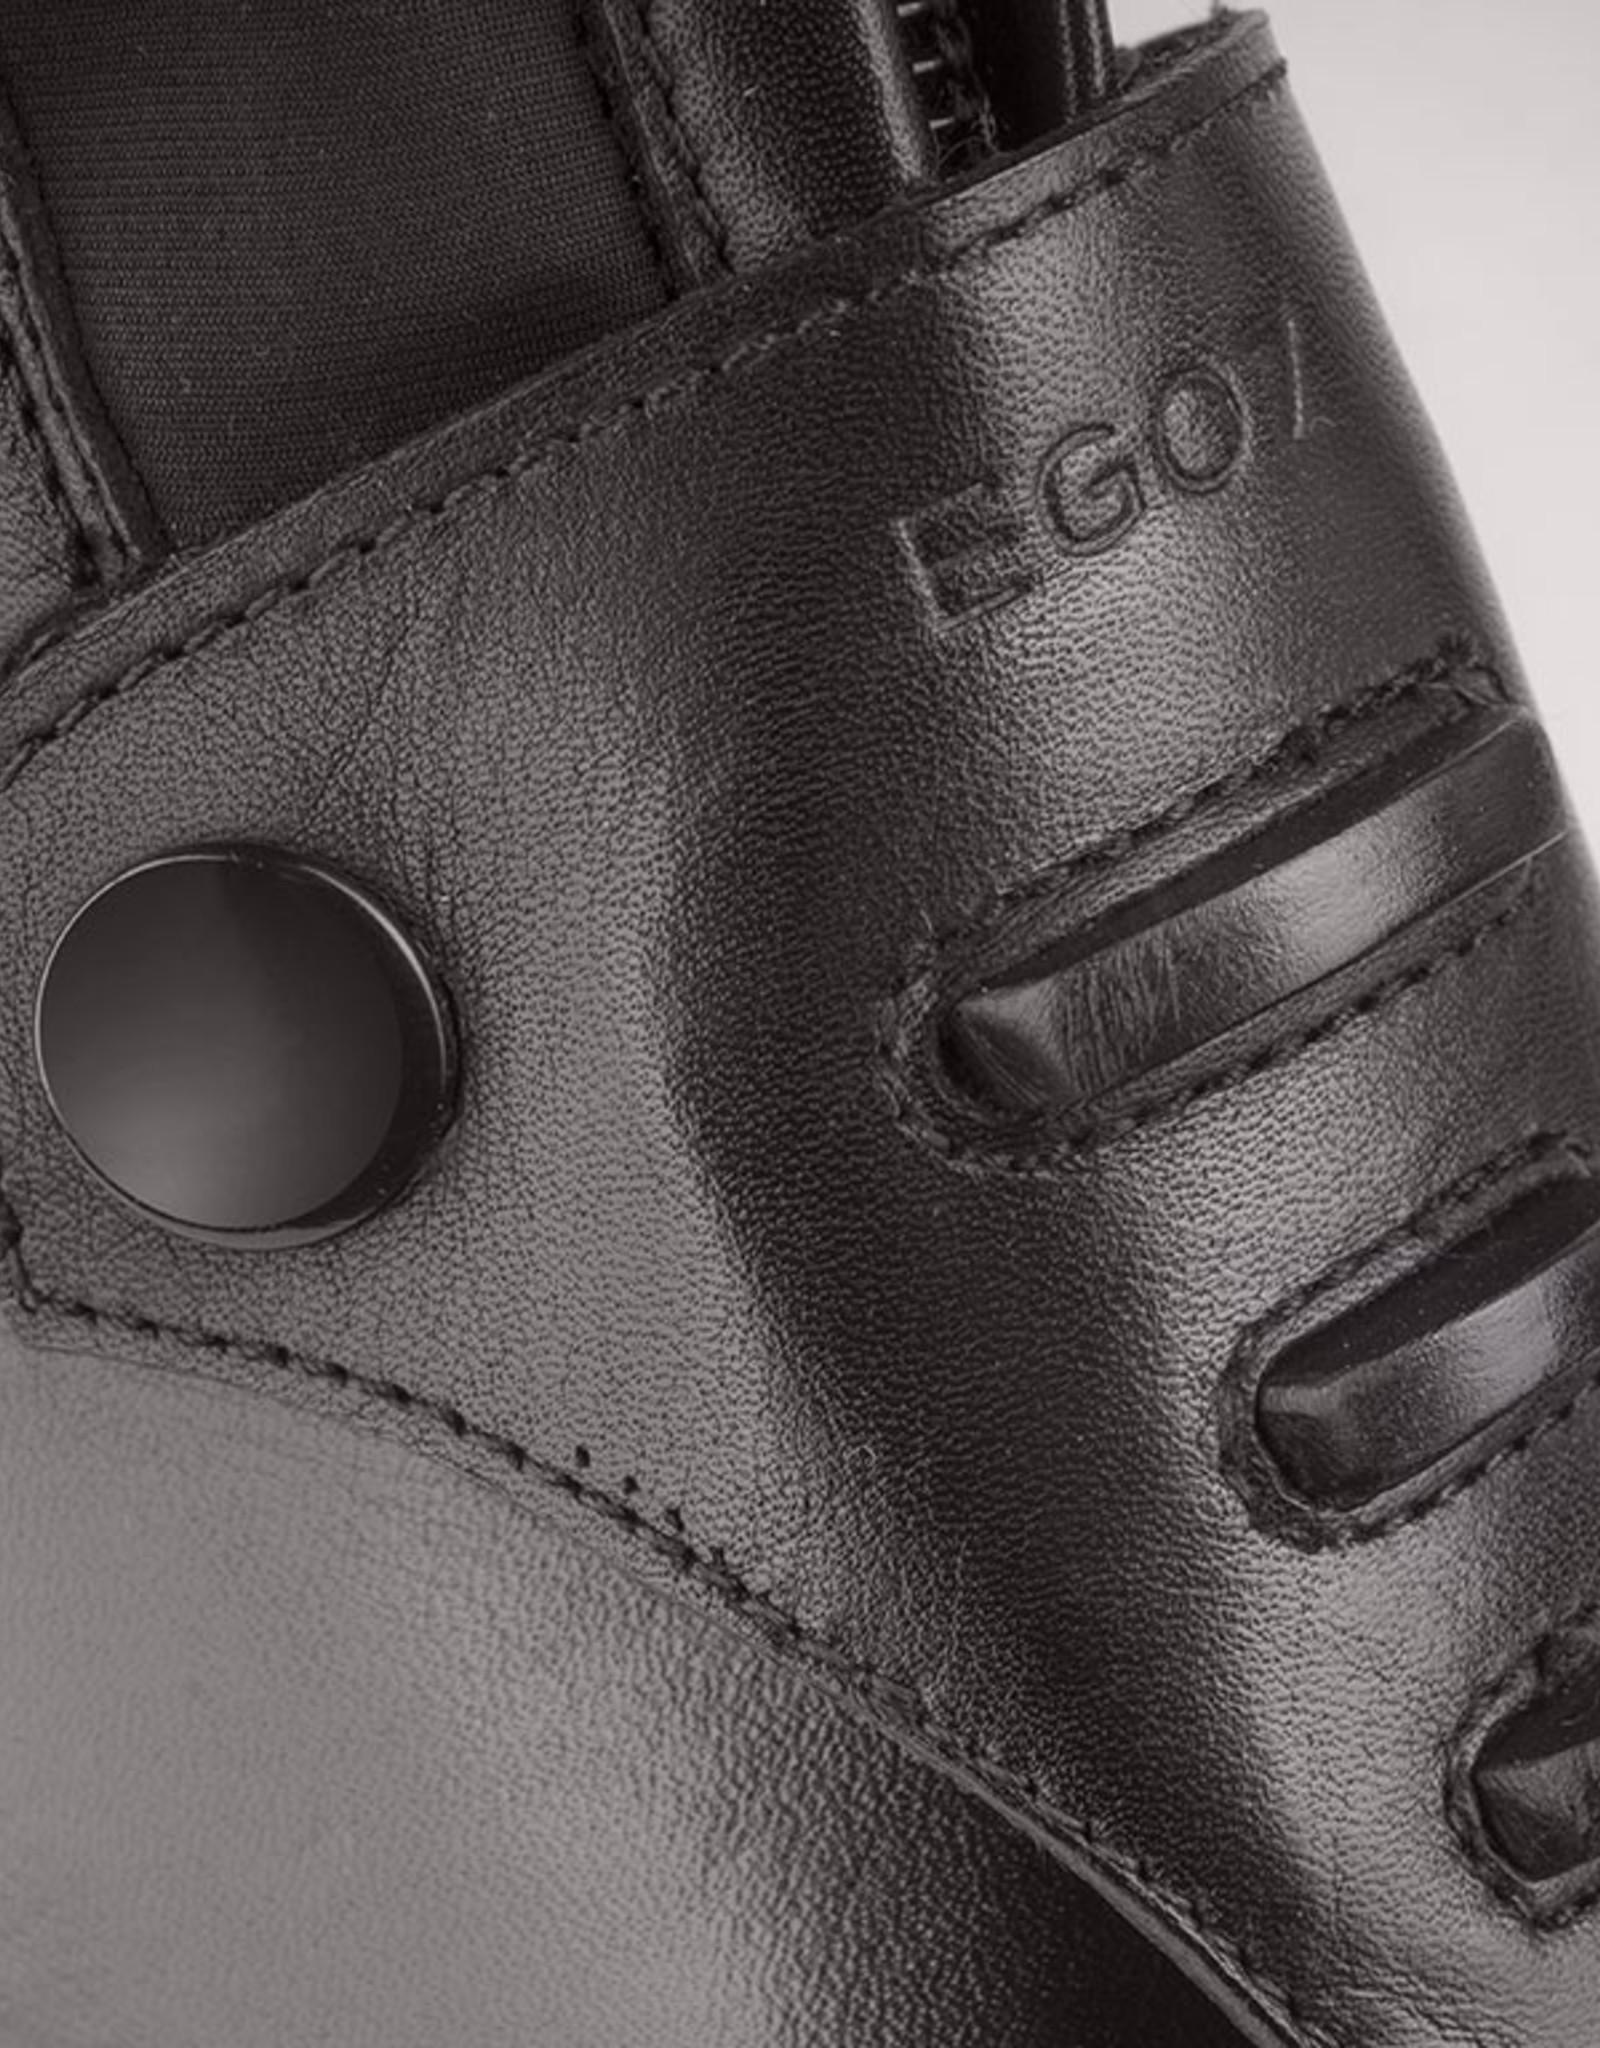 Ego 7 EGO7 Aries Tall Dress Boot